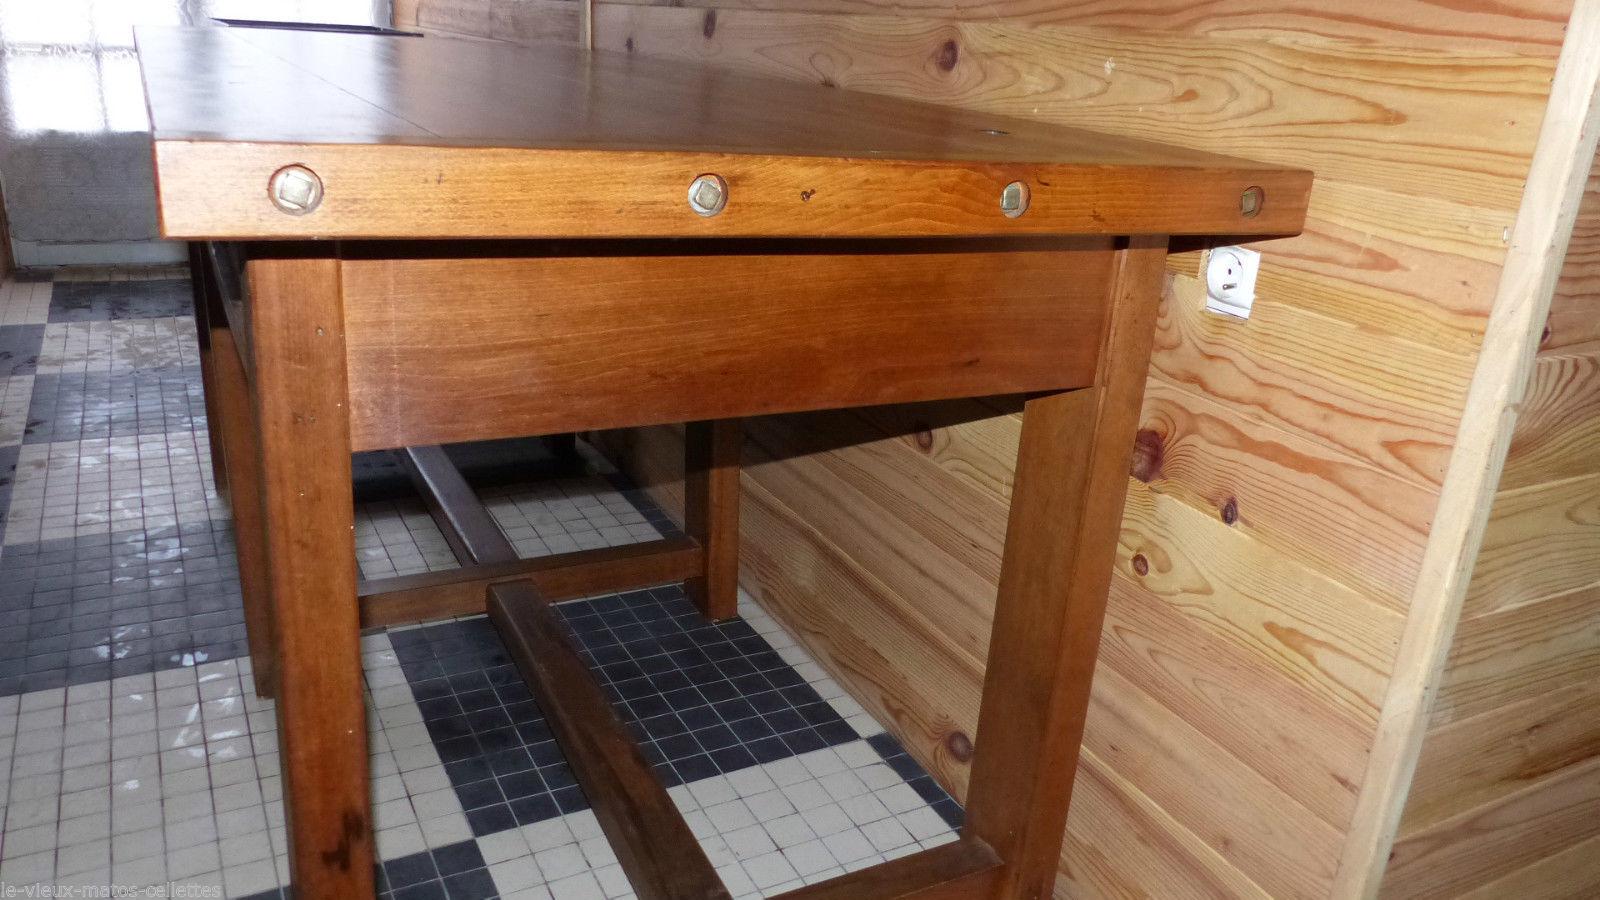 grande table ou tabli d 39 horloger en h tre d but xx me. Black Bedroom Furniture Sets. Home Design Ideas